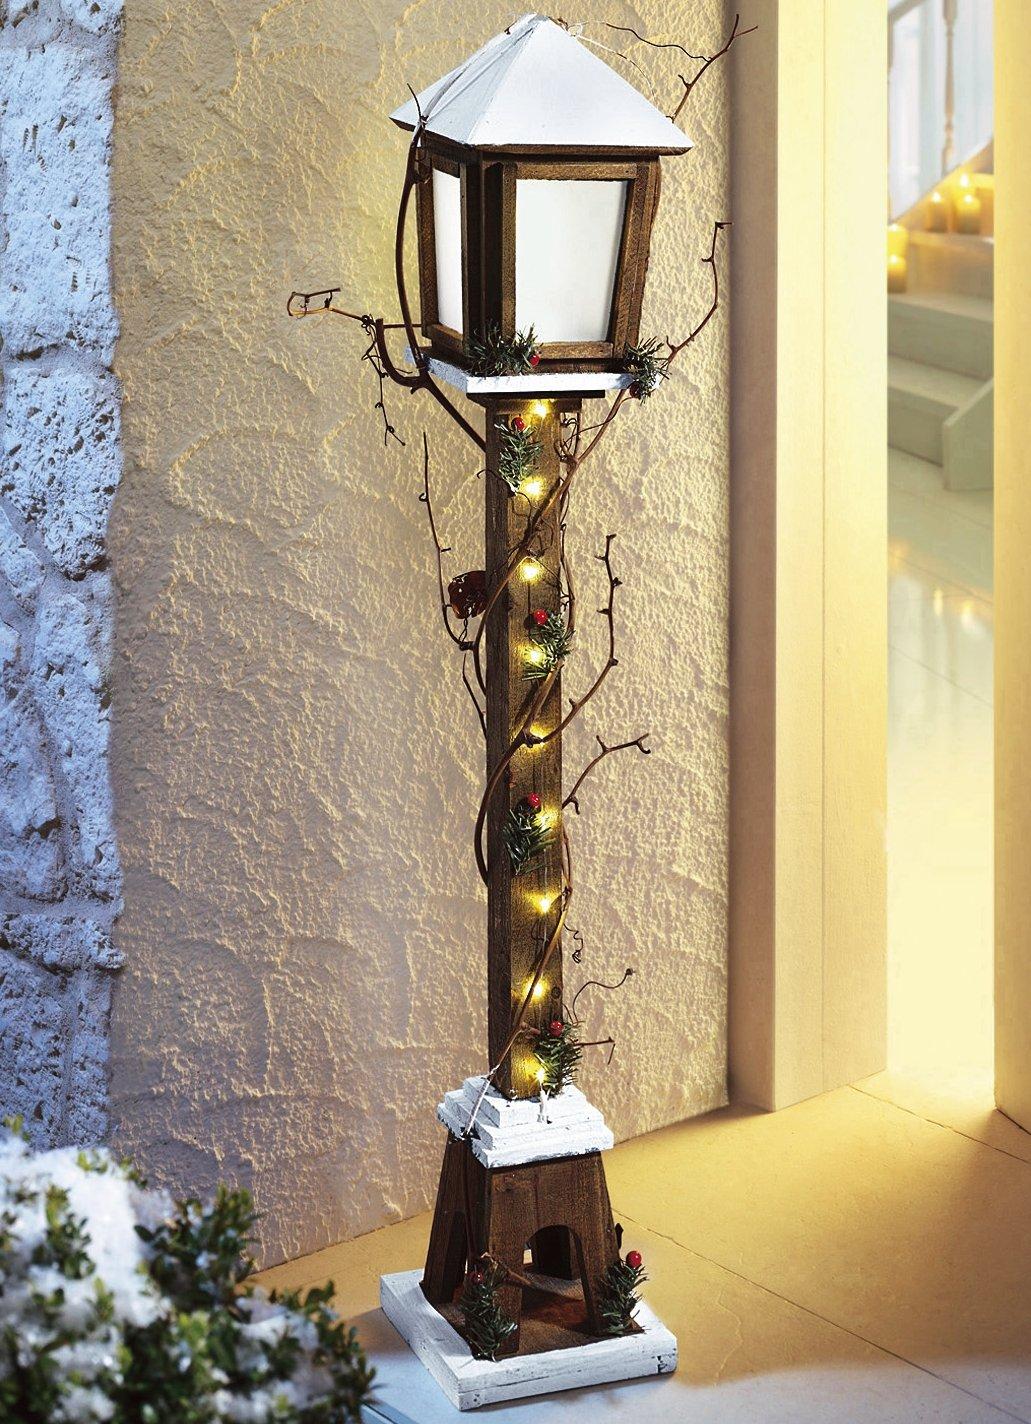 led leuchte aus holz au enleuchte lampe licht leuchte winterdeko. Black Bedroom Furniture Sets. Home Design Ideas